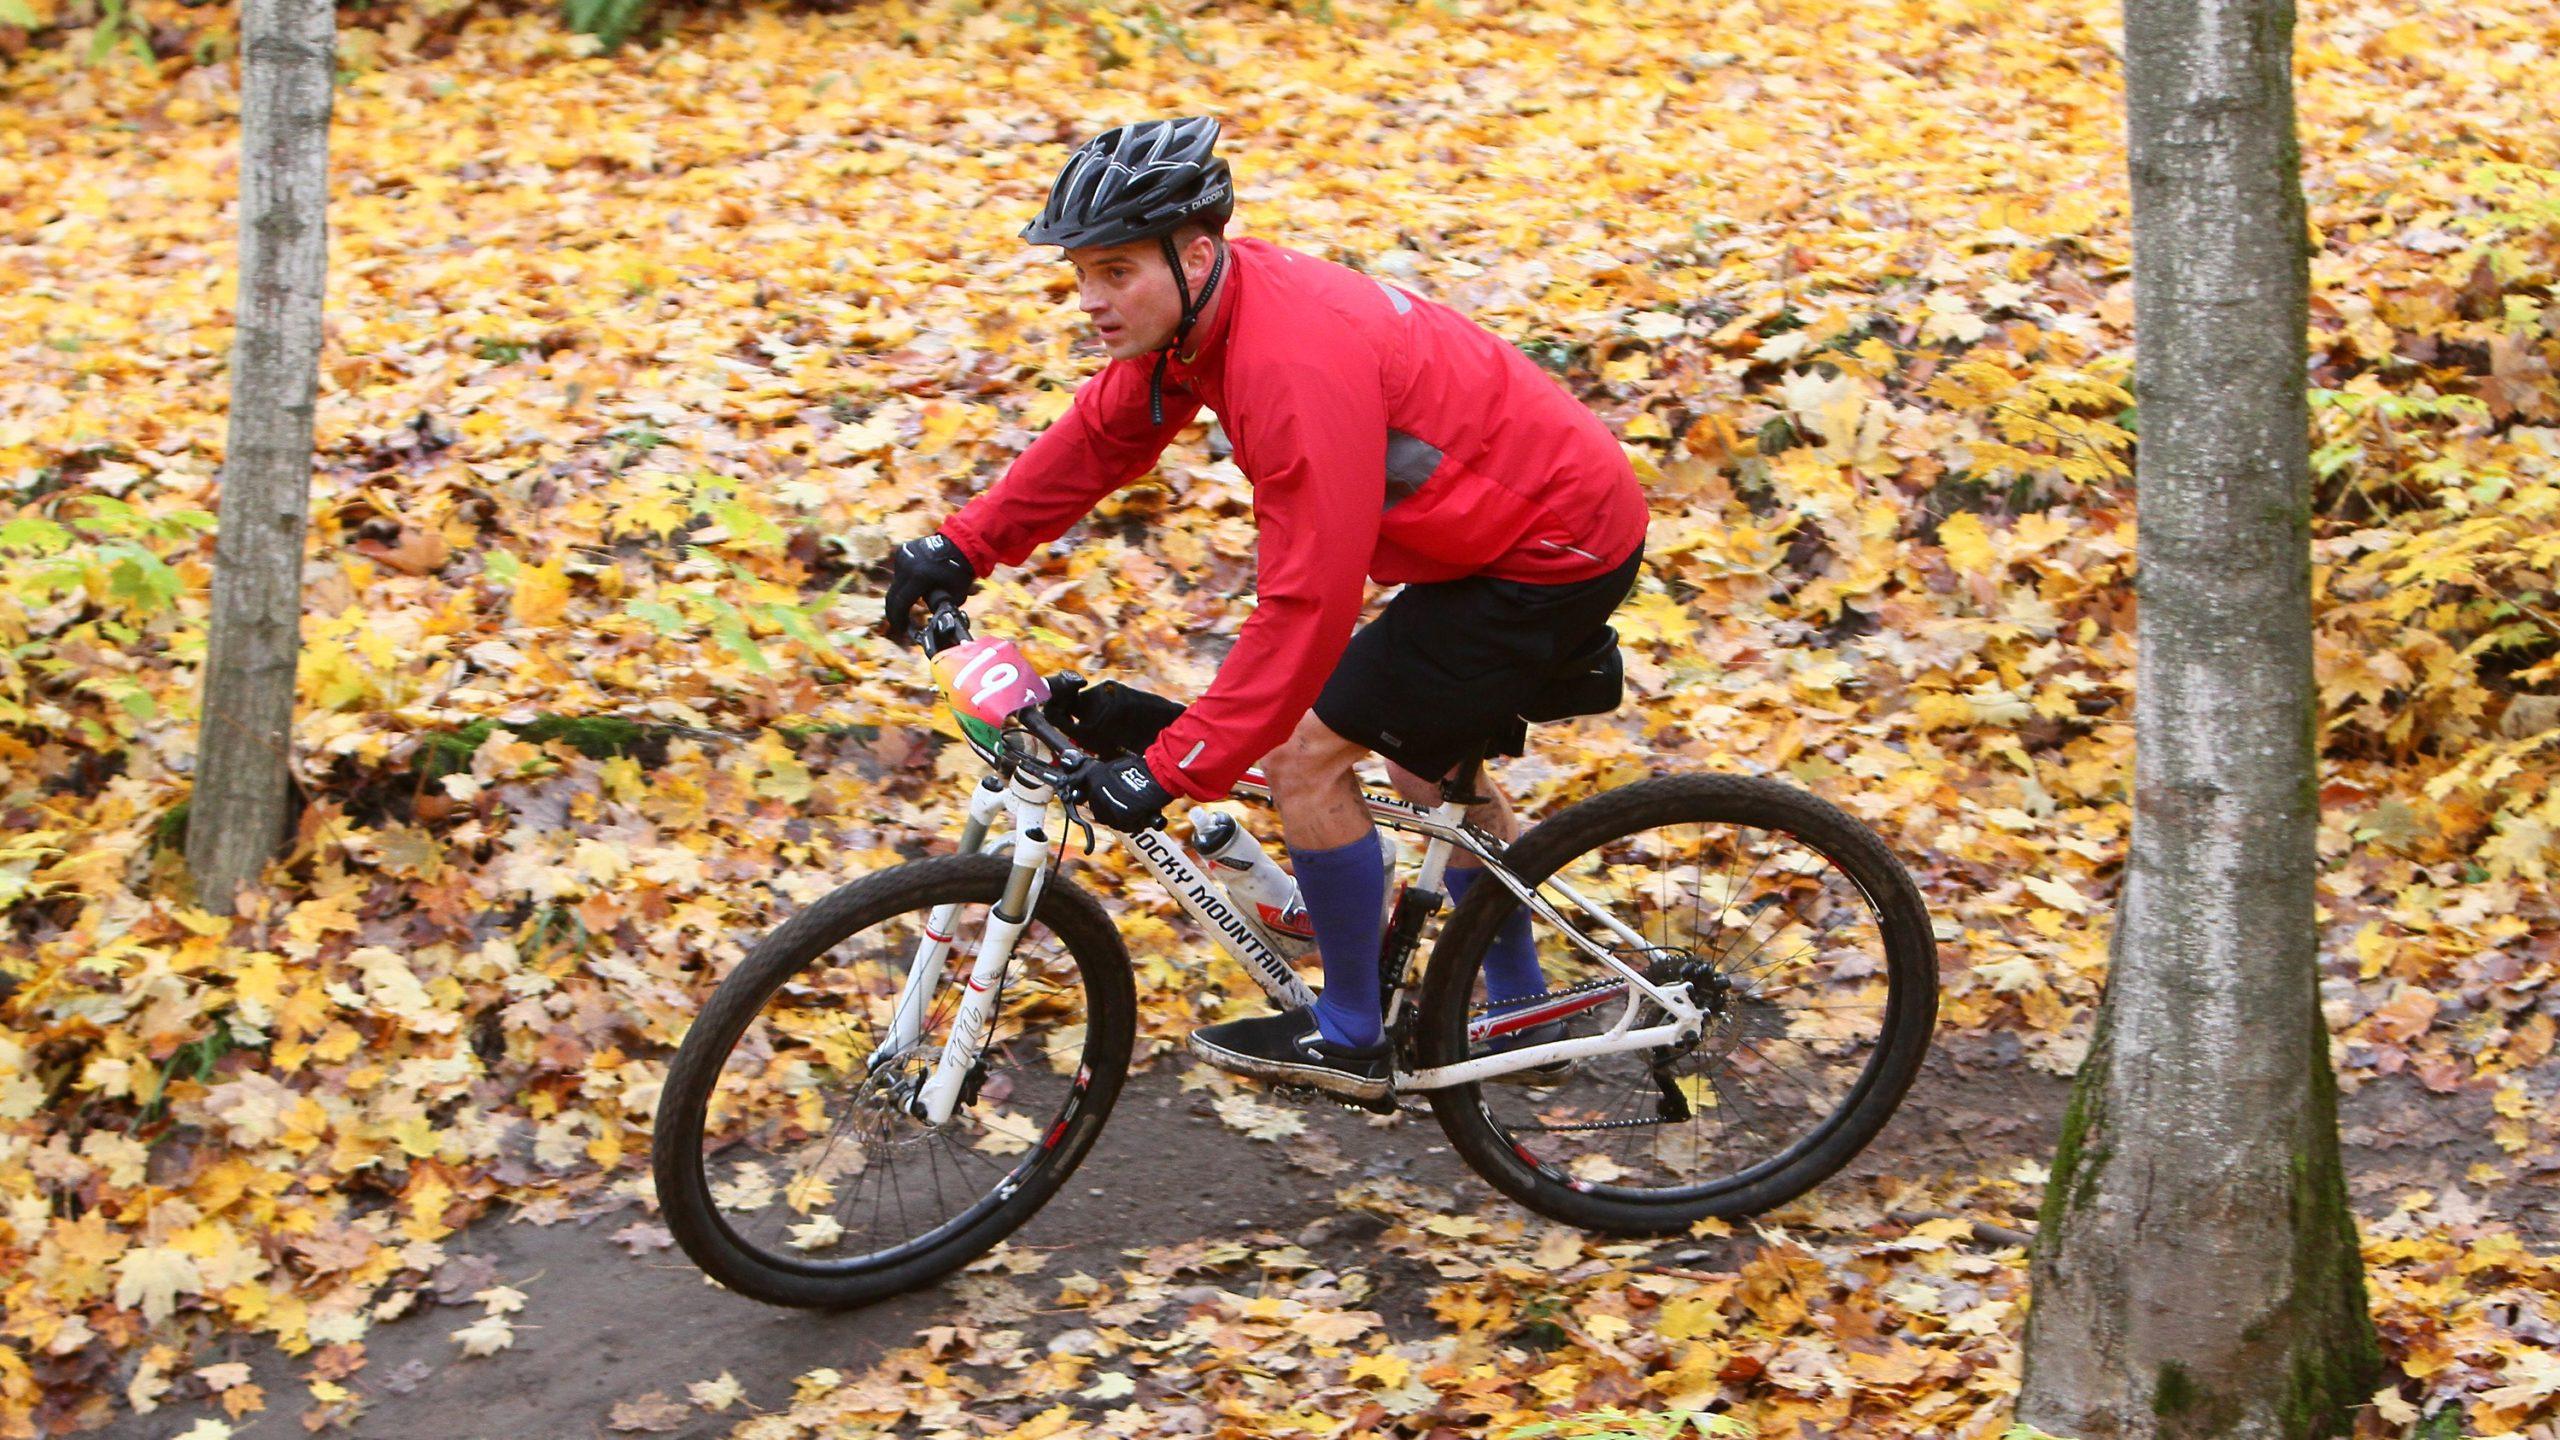 First mountain bike race, hardwood single track challenge in 2014